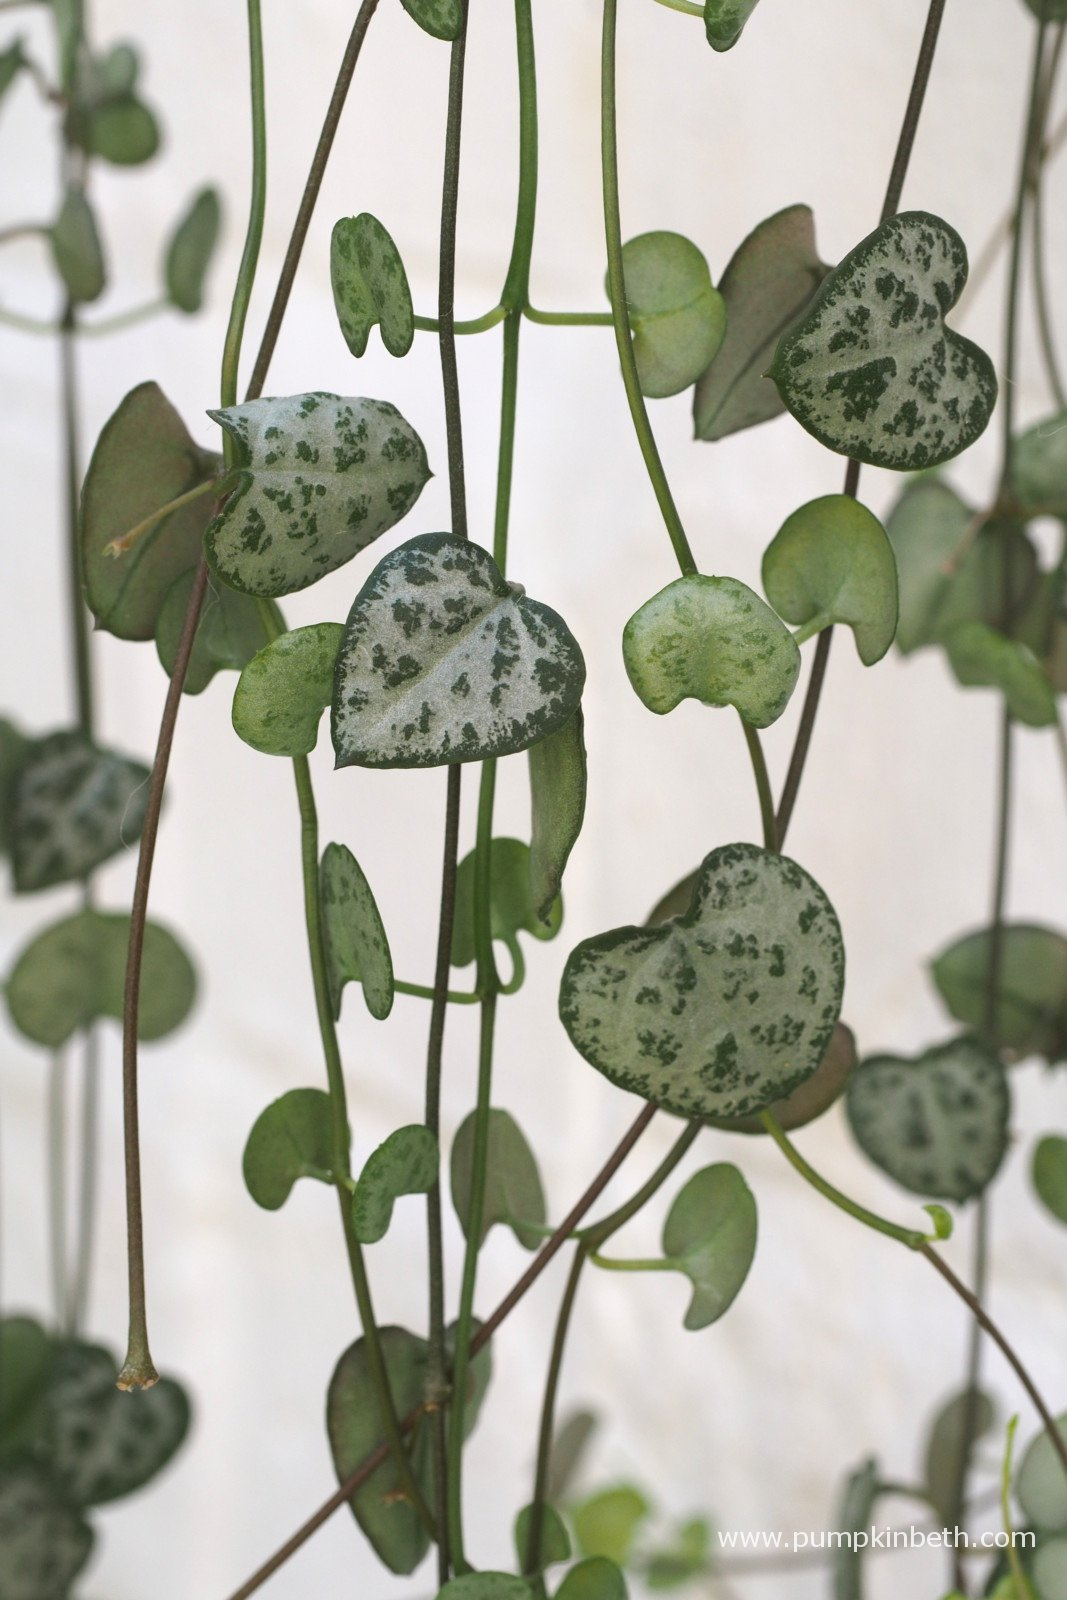 Trailing Plants Hanging Baskets